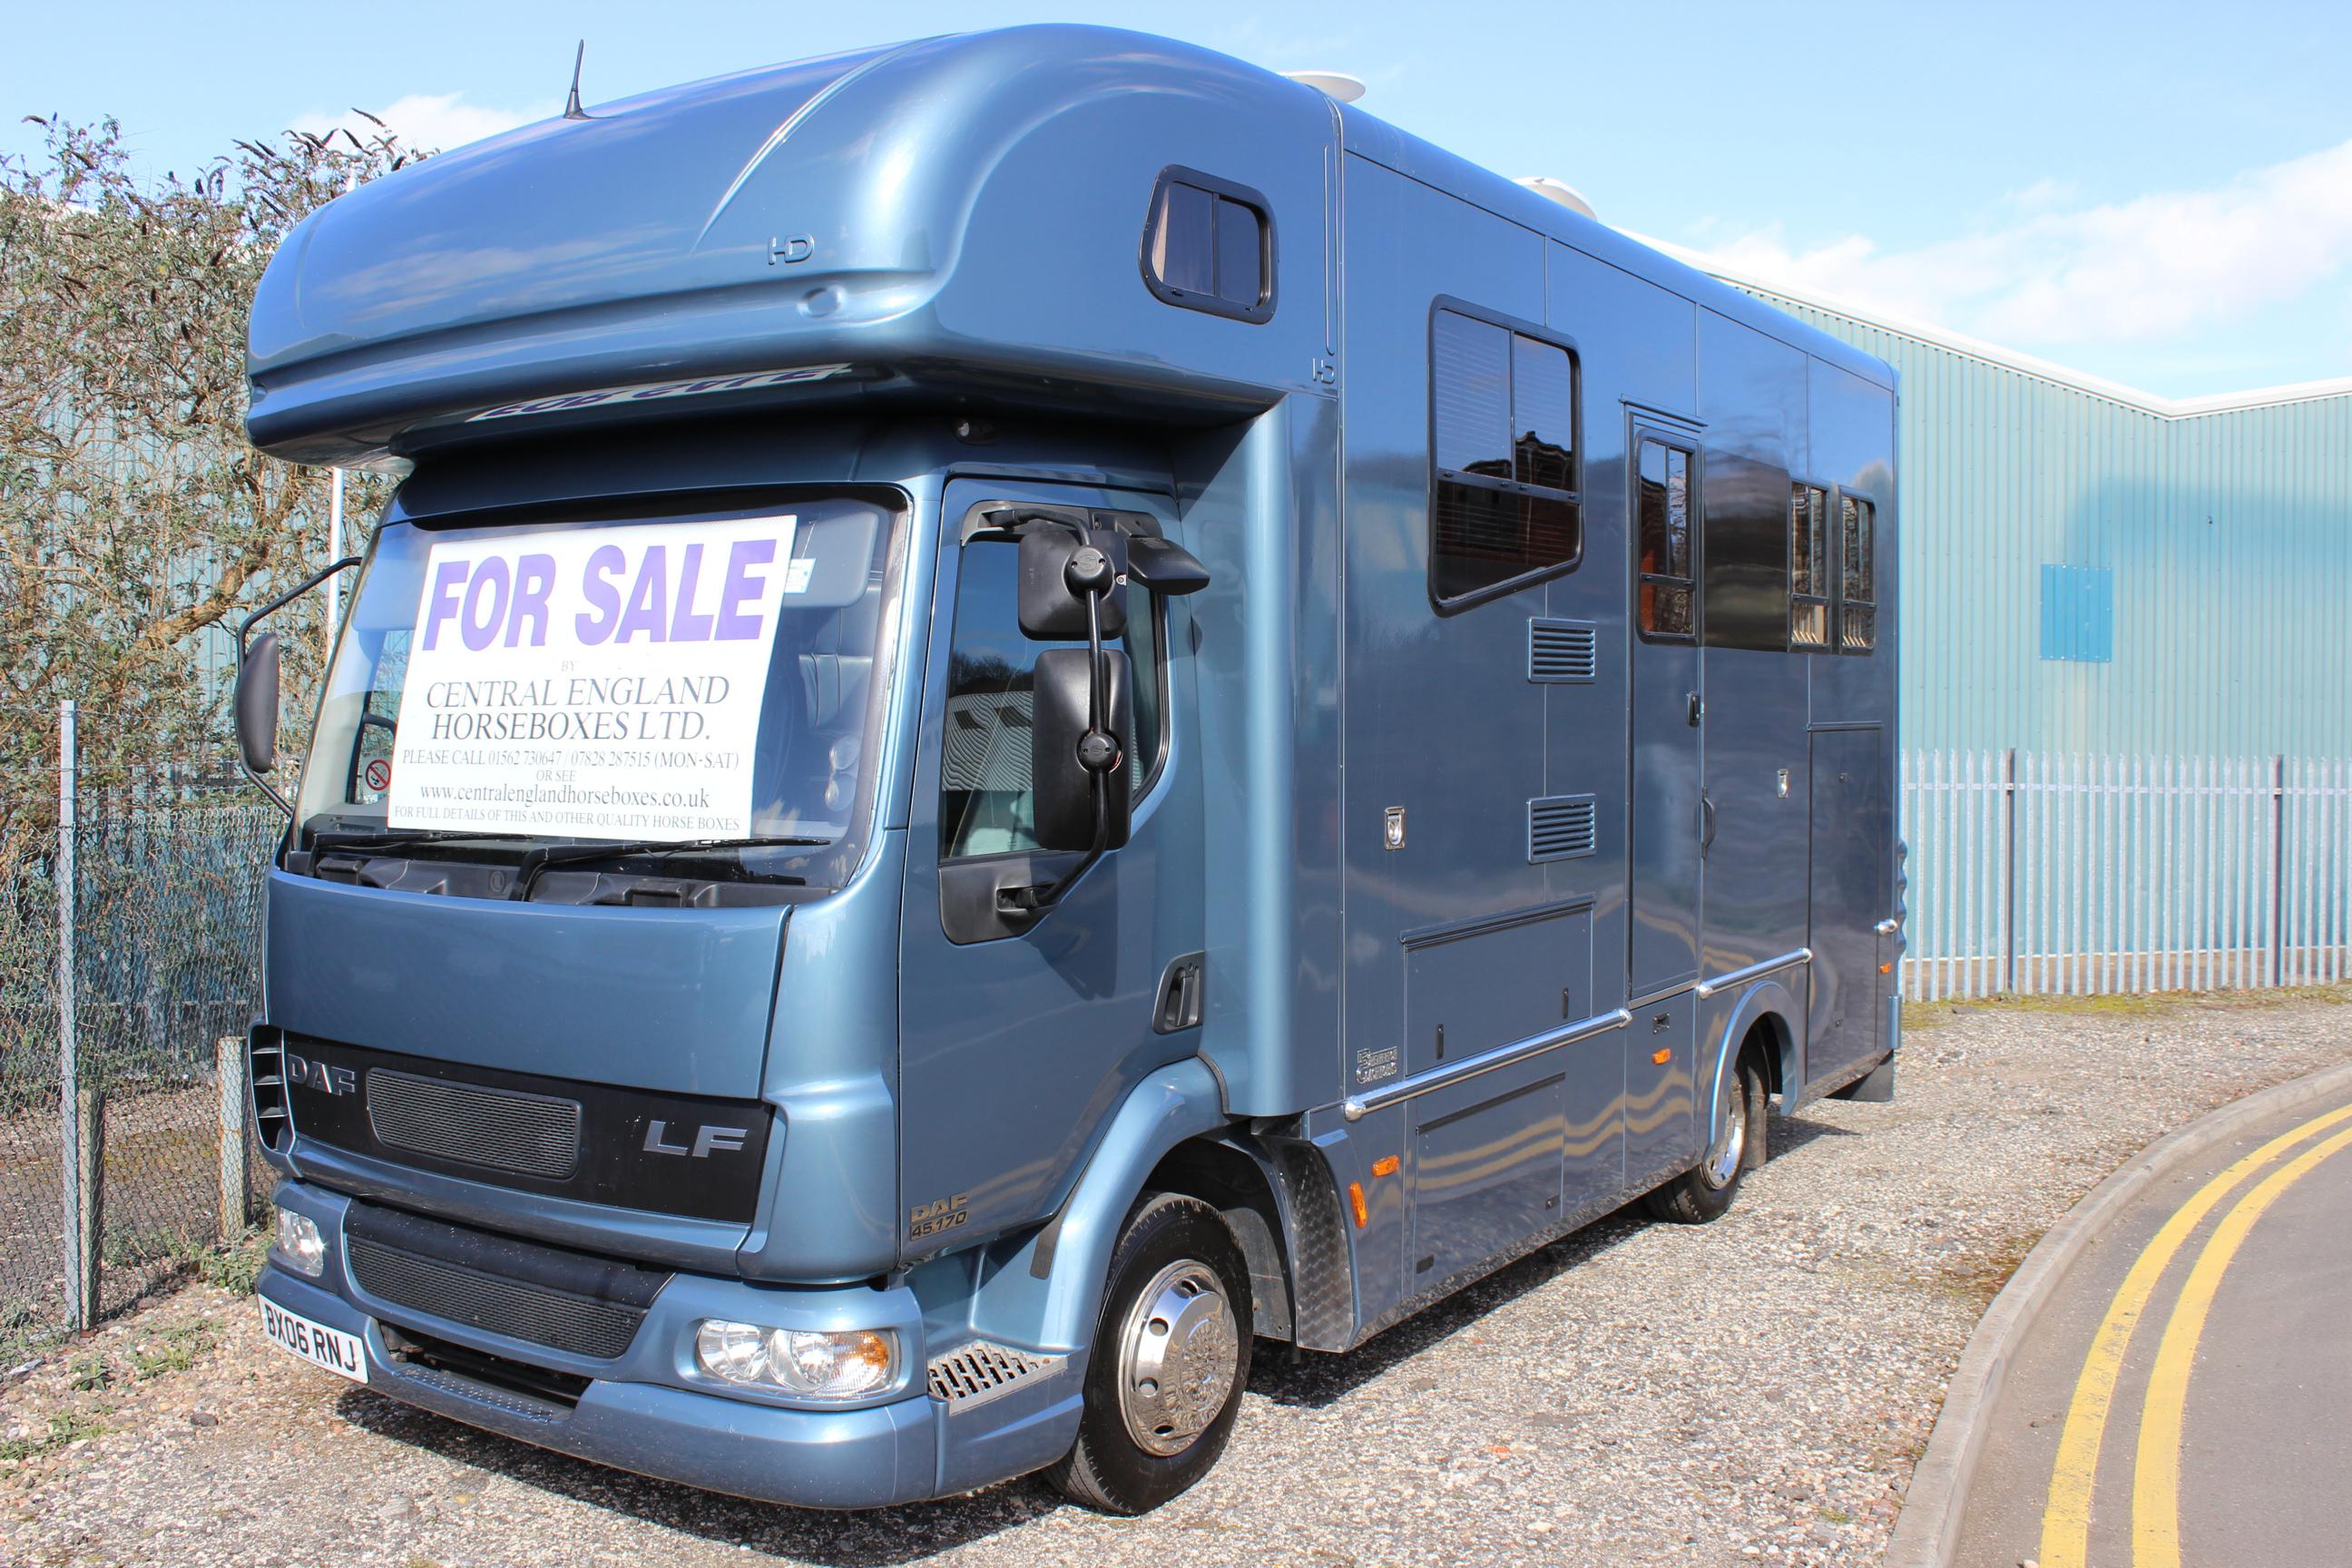 Compact Bretherton Luxury Horsebox For Sale